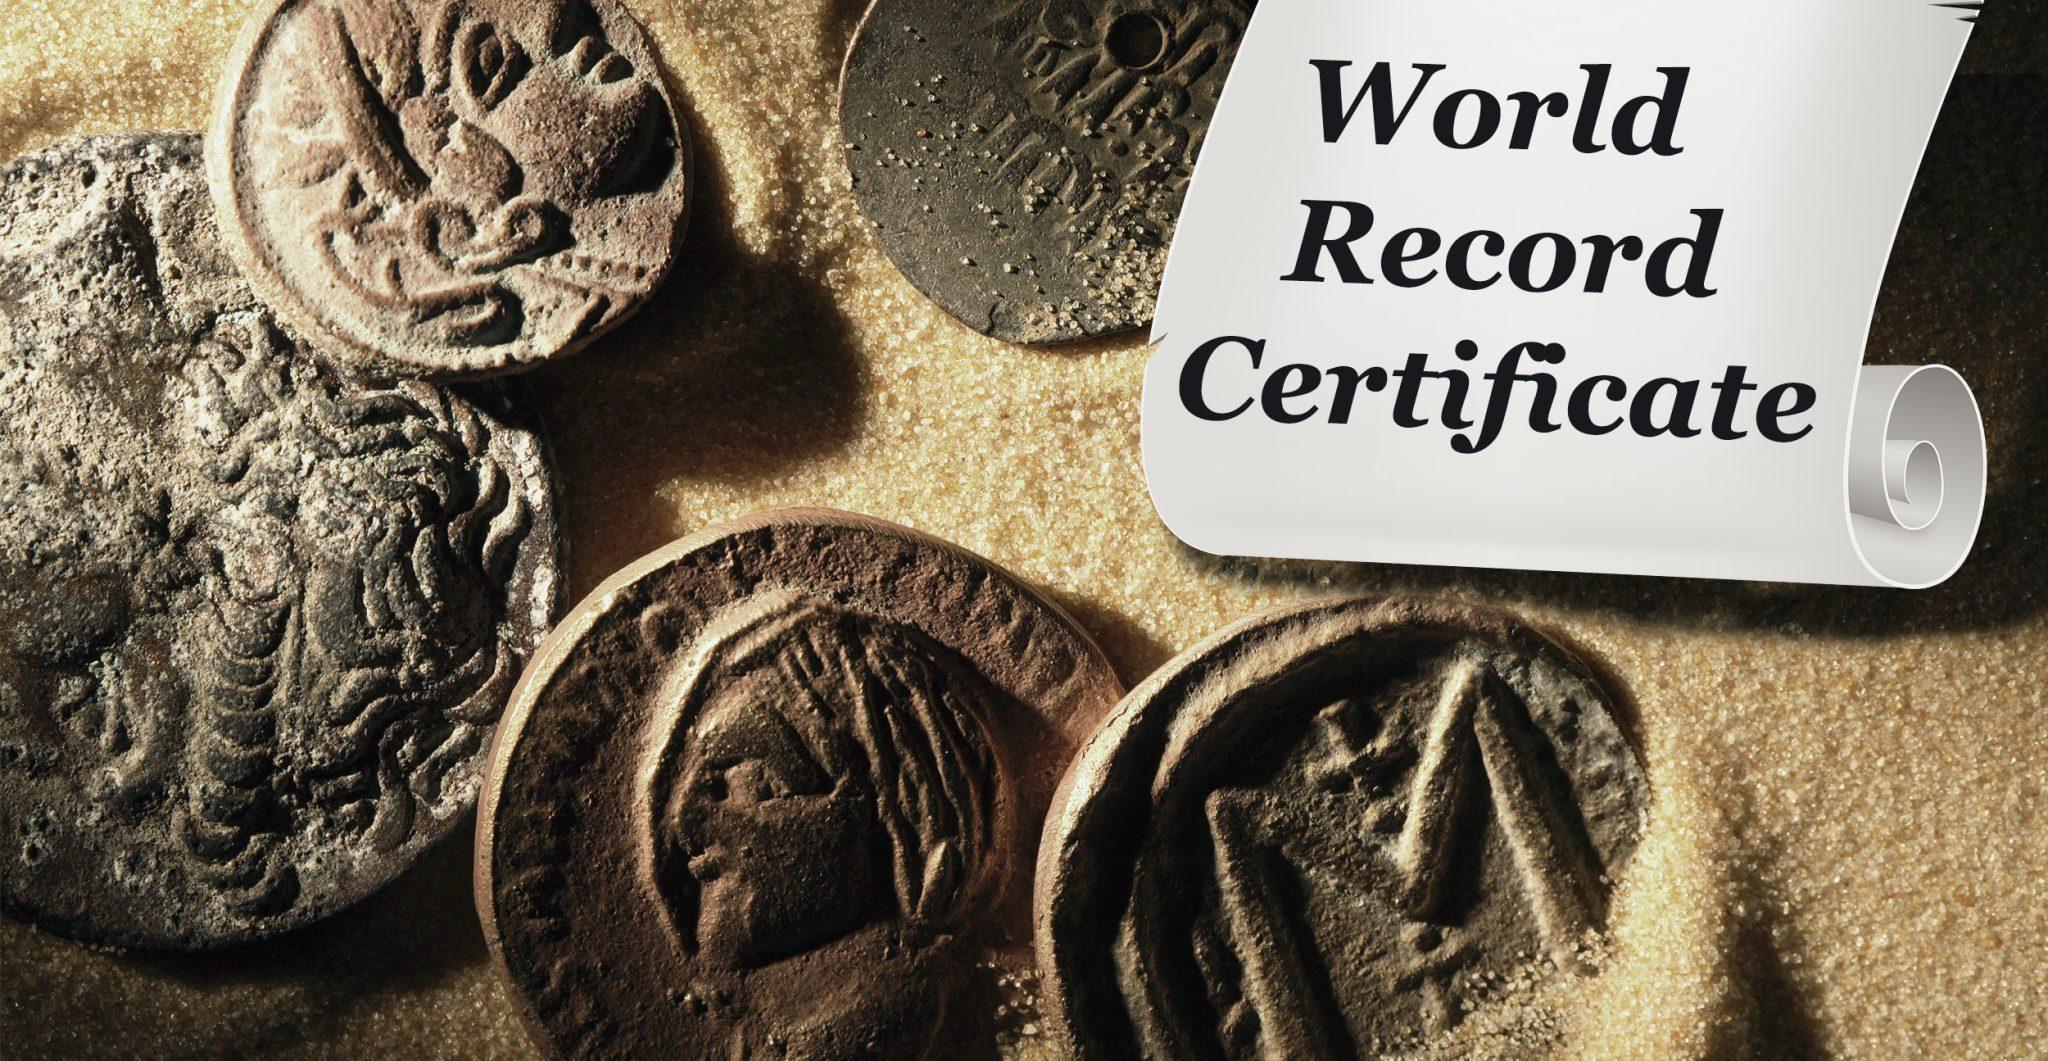 Iron Age coins